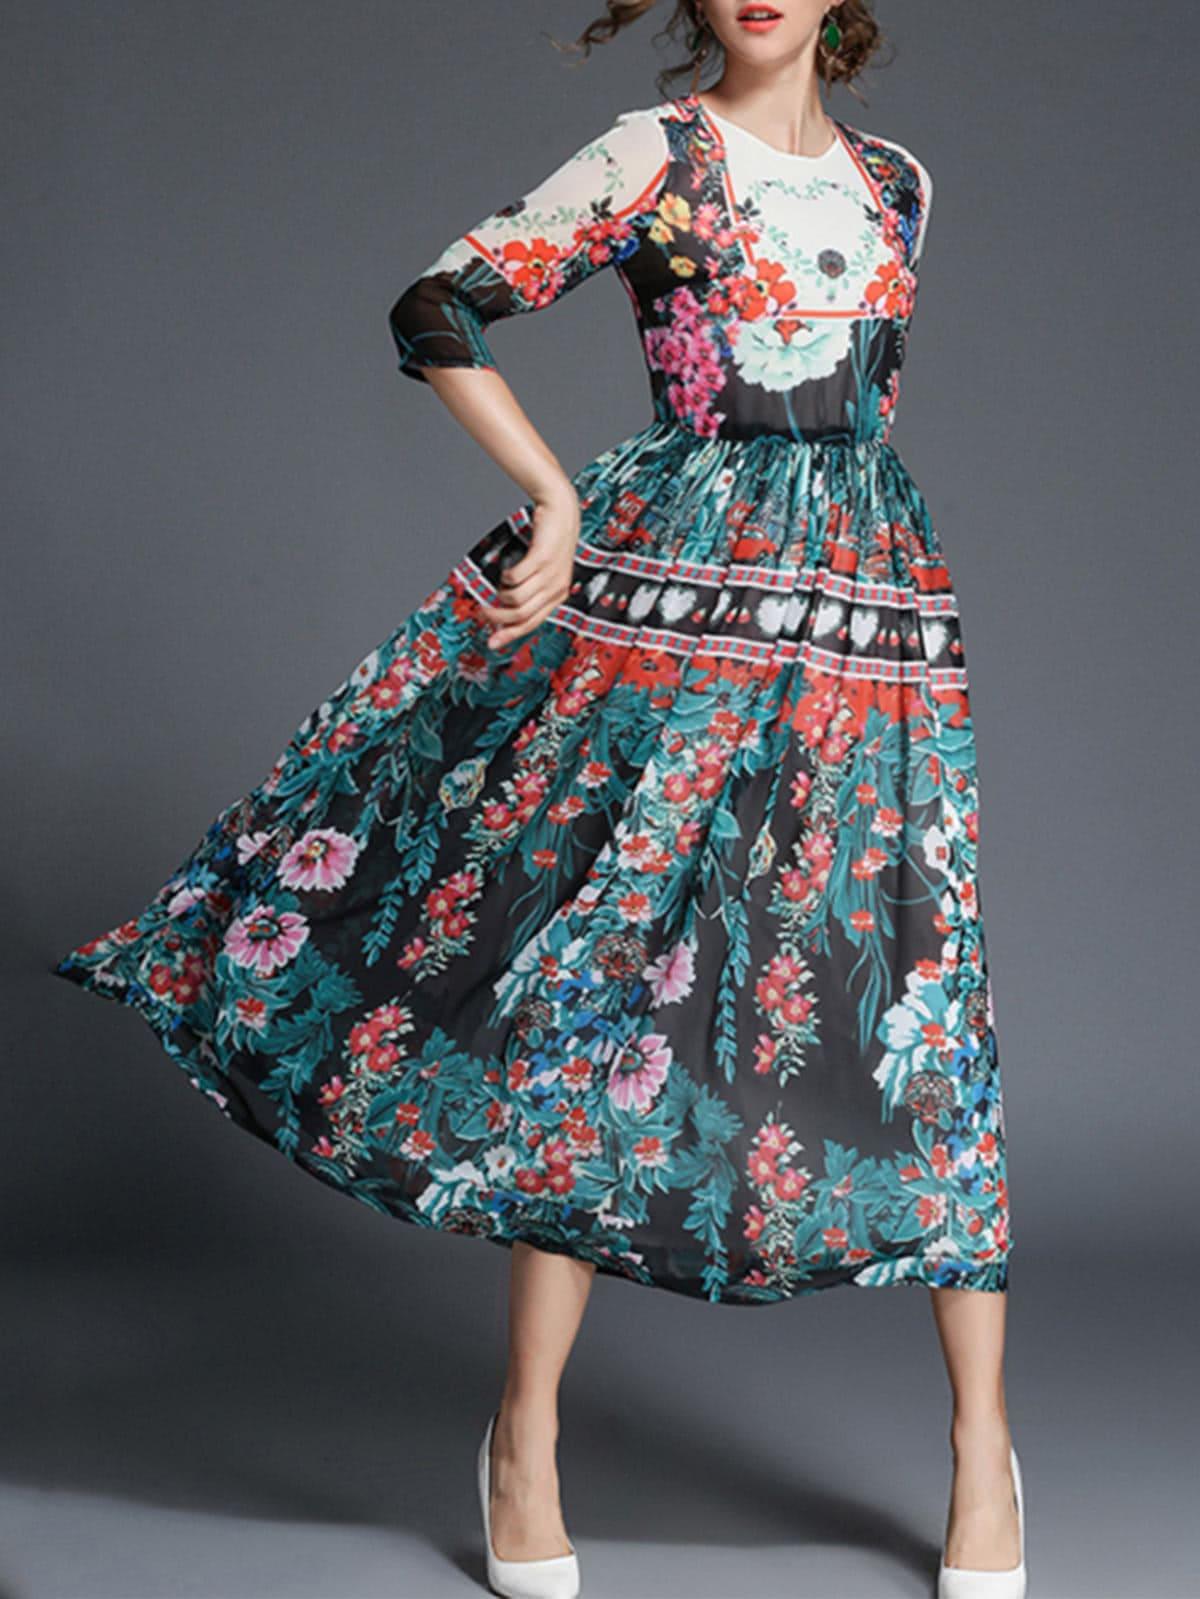 Botanical Print Dress